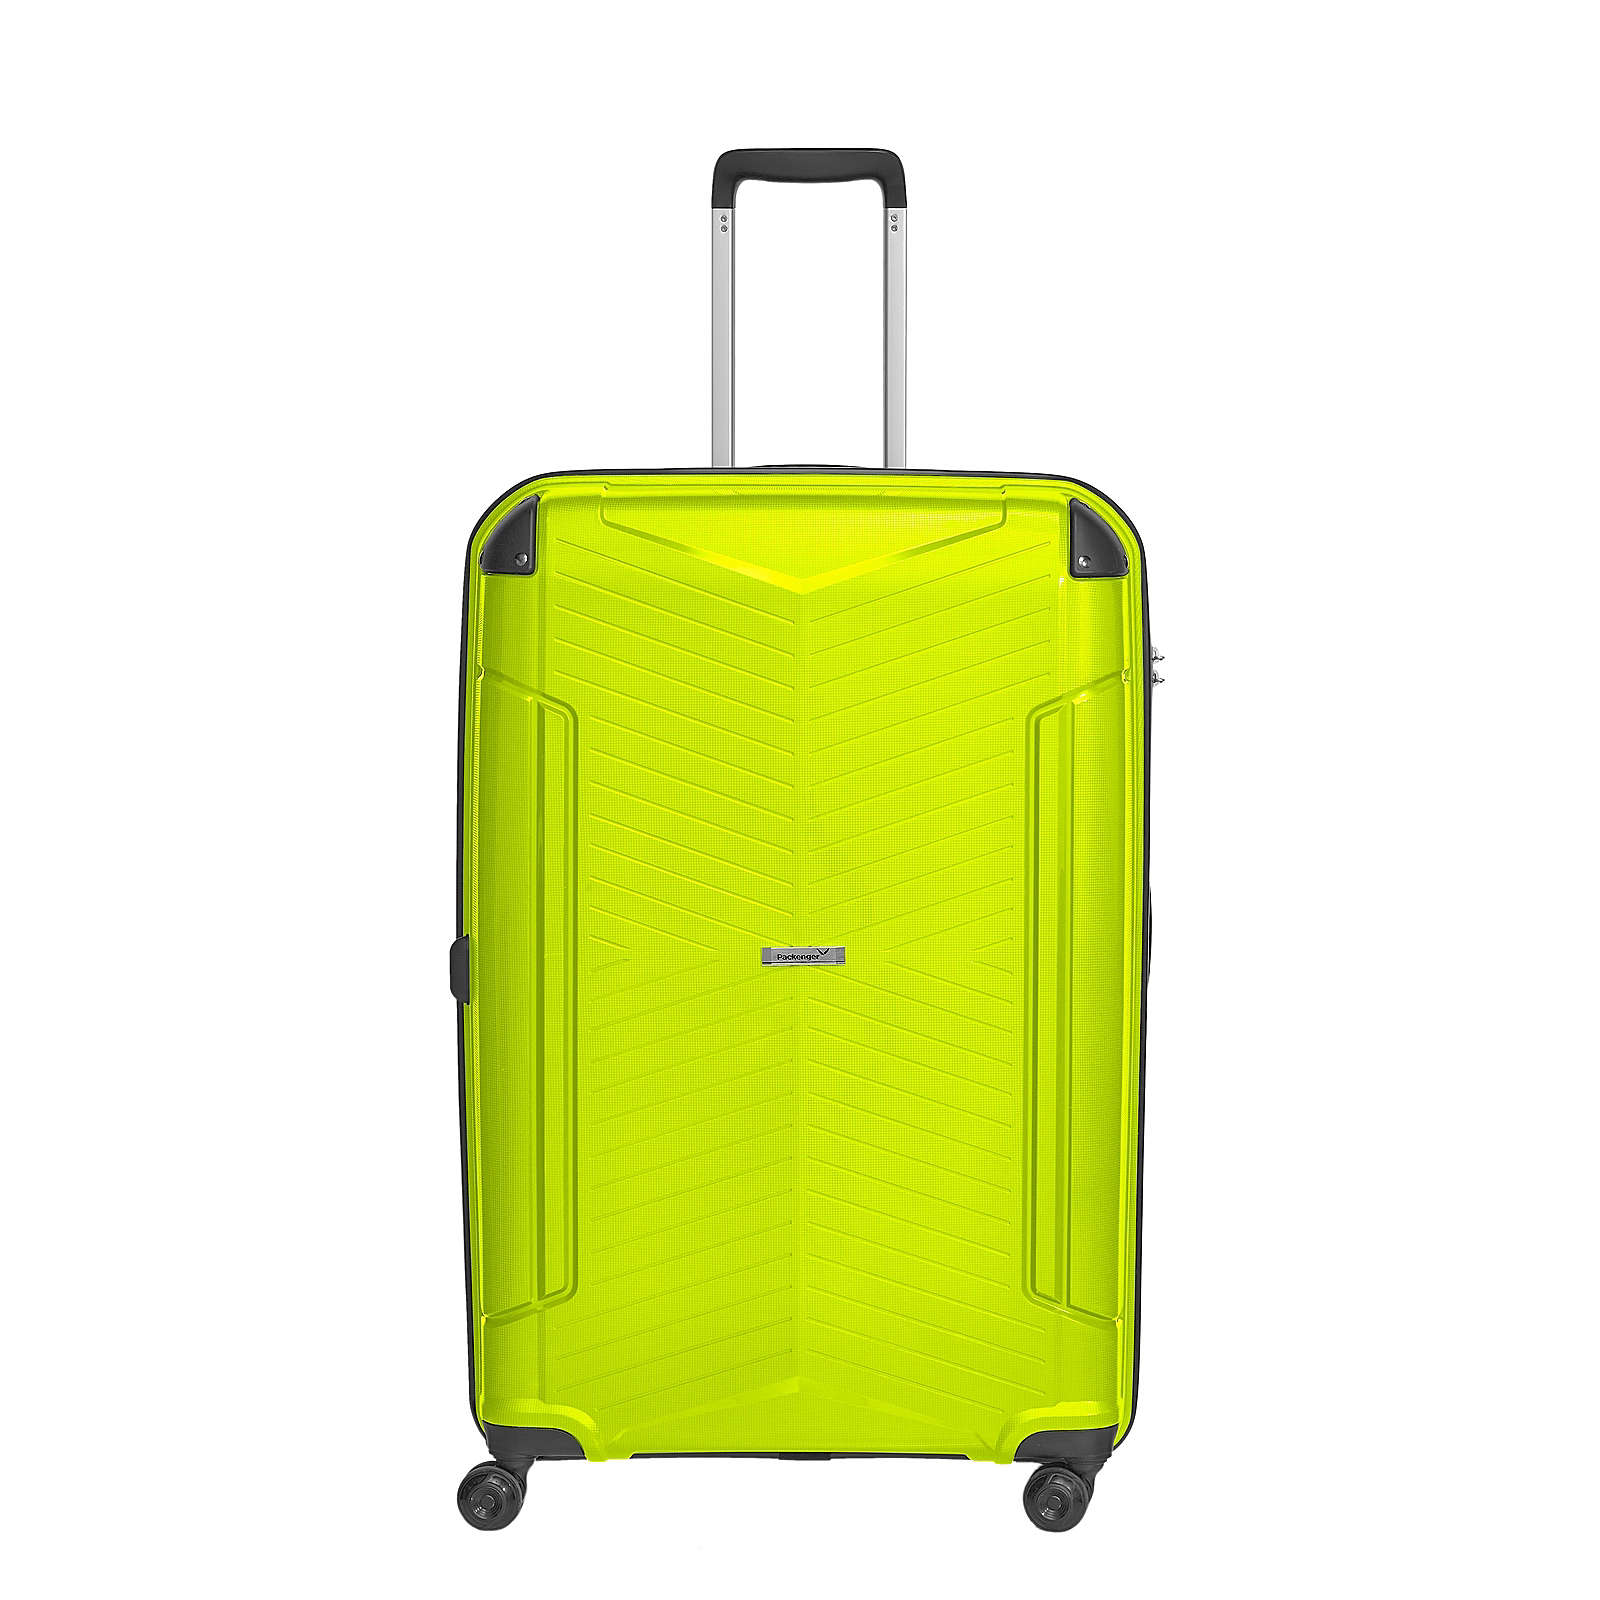 Packenger Koffer Premium Silent Reisekoffer hellgrün